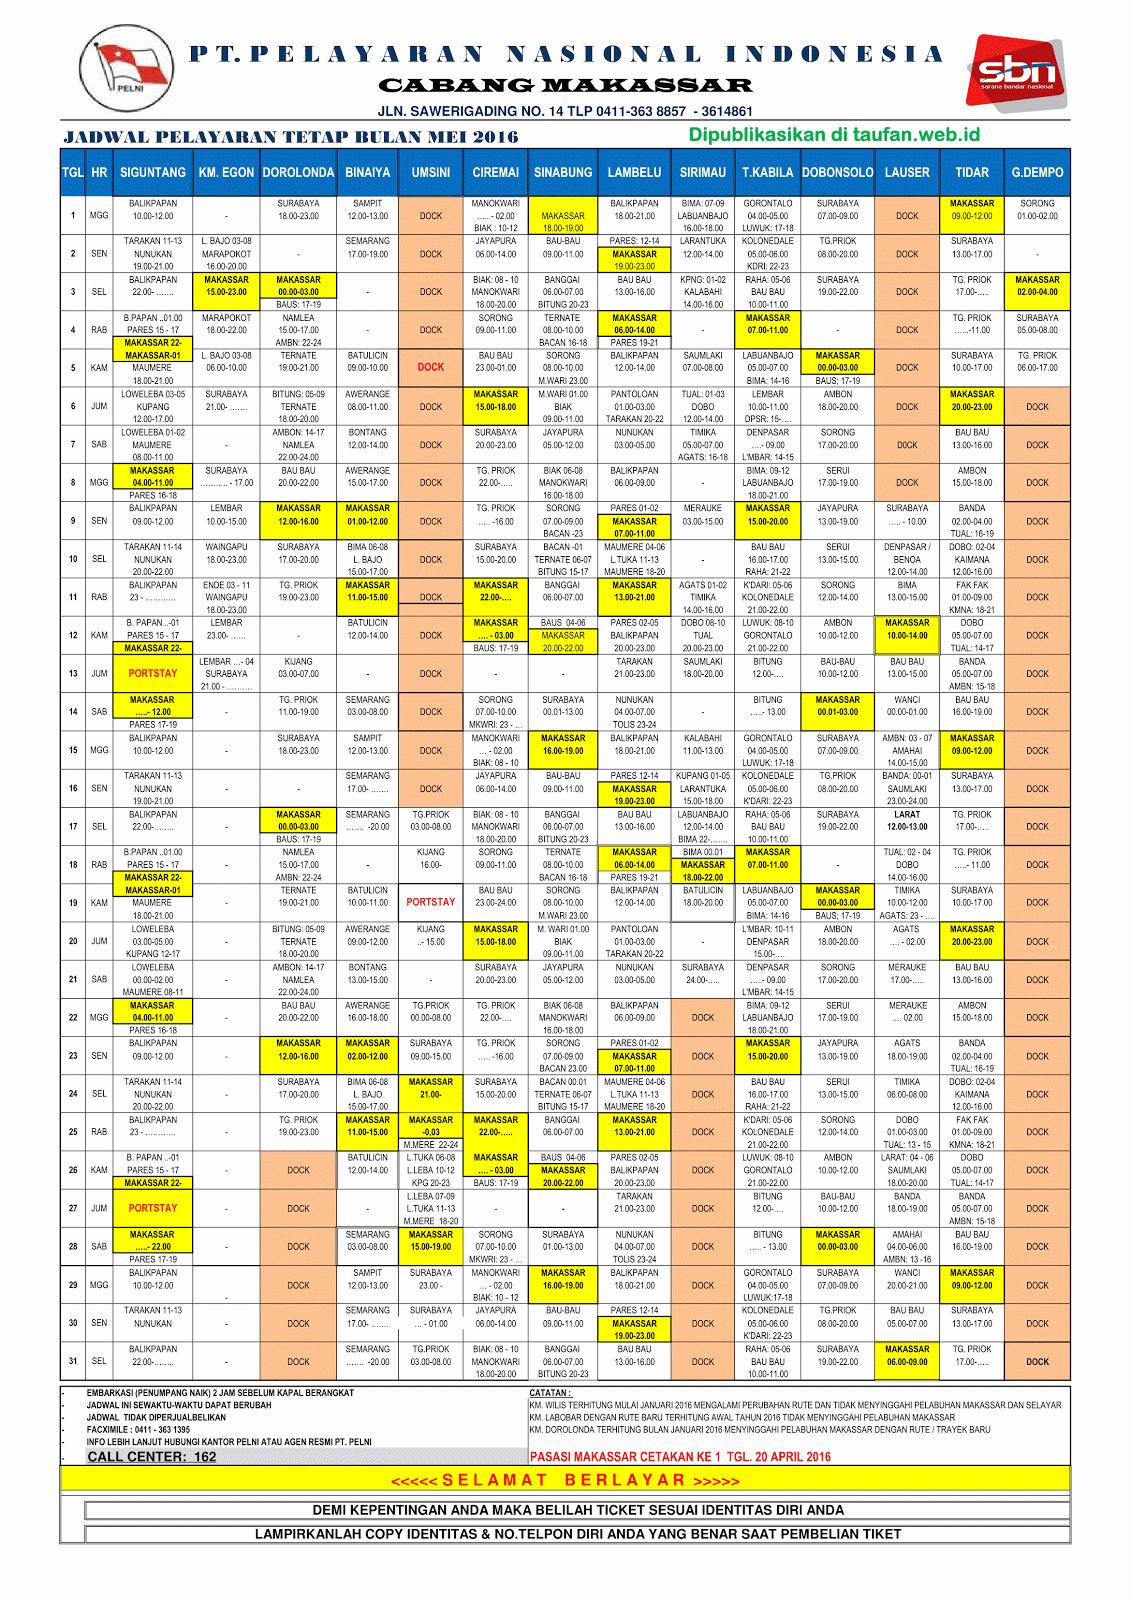 Jadwal Kapal PT. Pelni Mei 2016